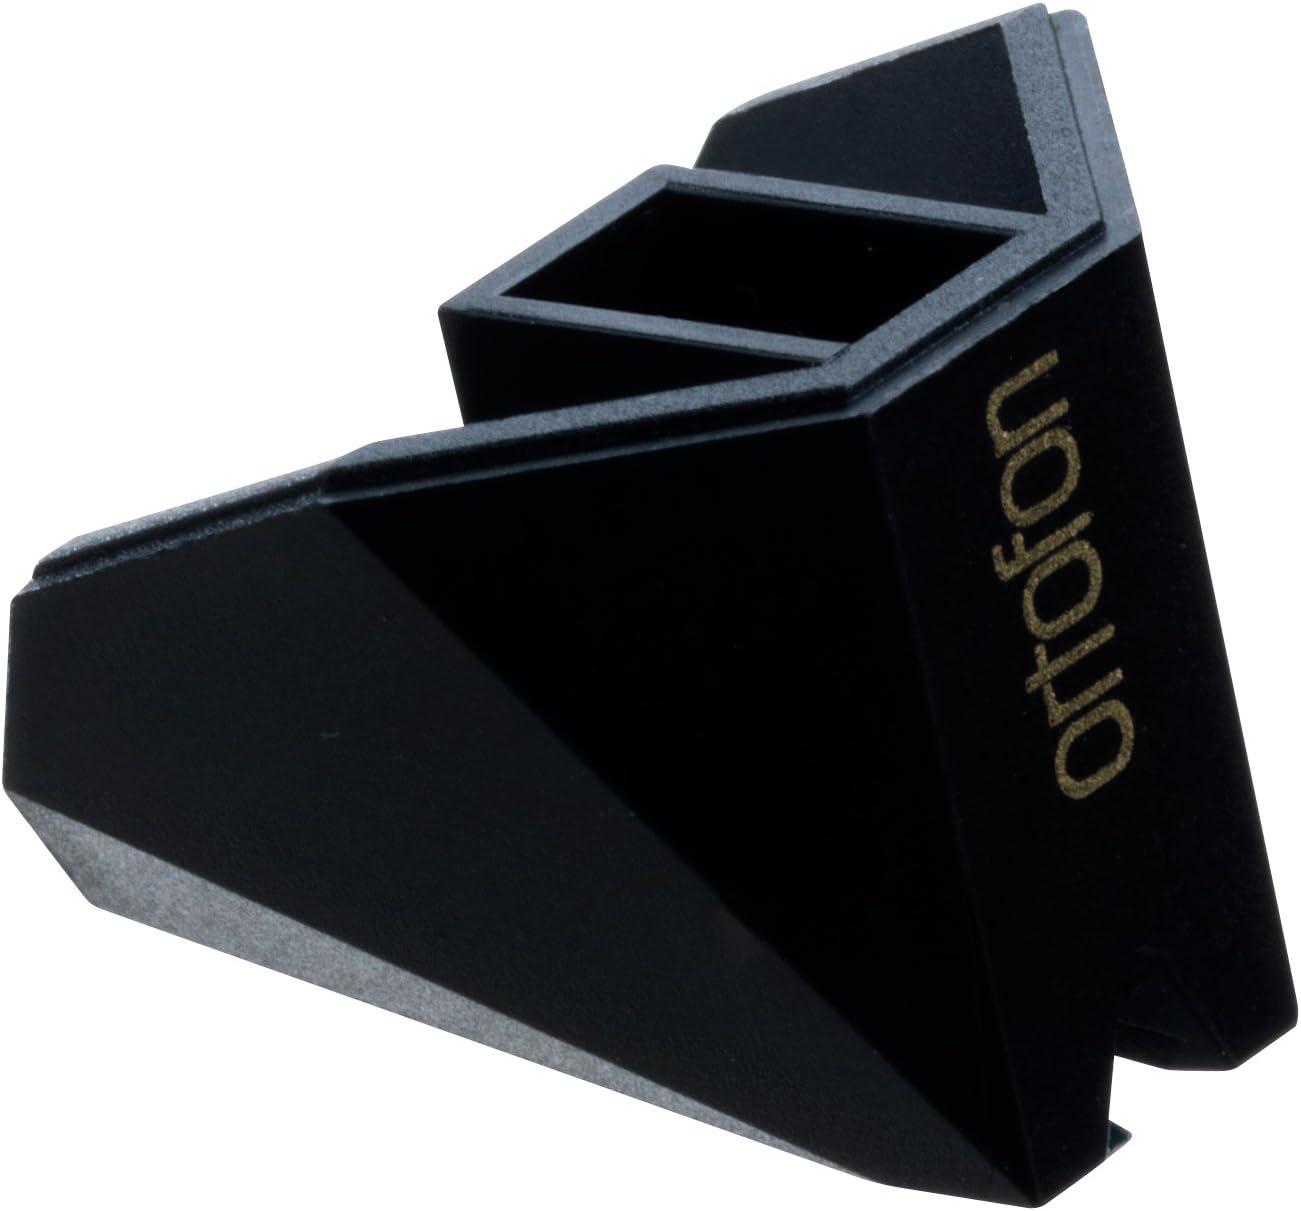 Ortofon Stylus 2m Black Nadel Elektronik